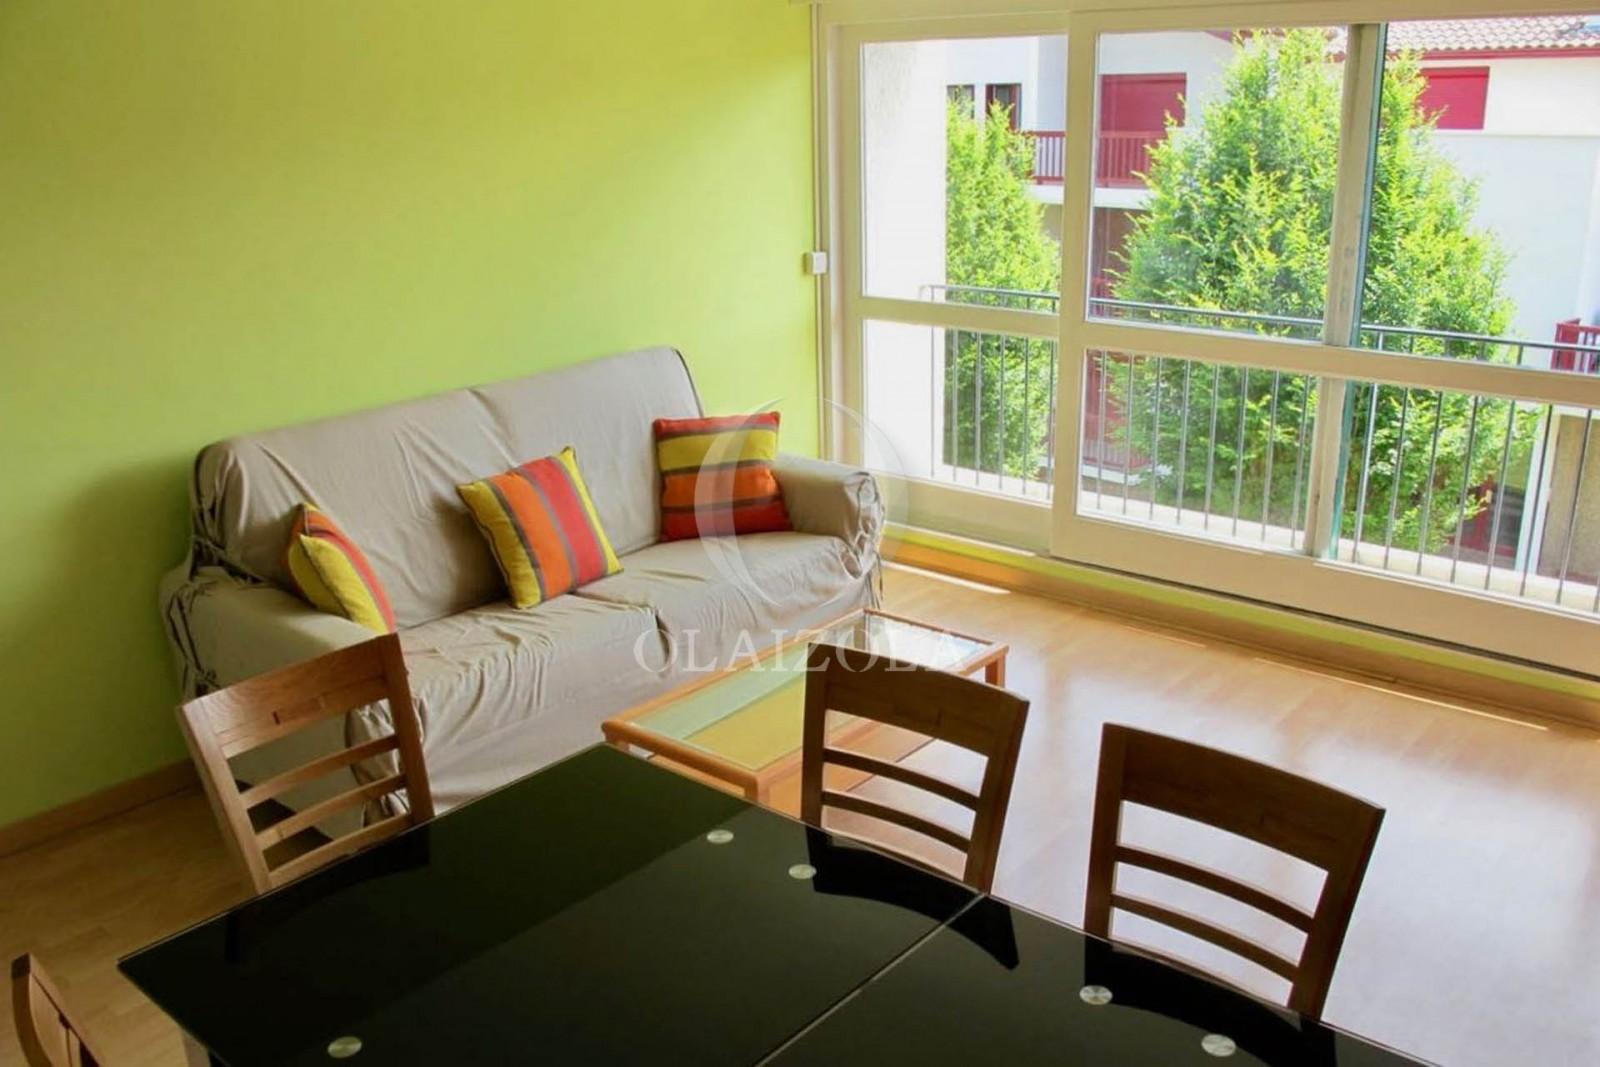 vacances a l abordage agence olaizola location. Black Bedroom Furniture Sets. Home Design Ideas